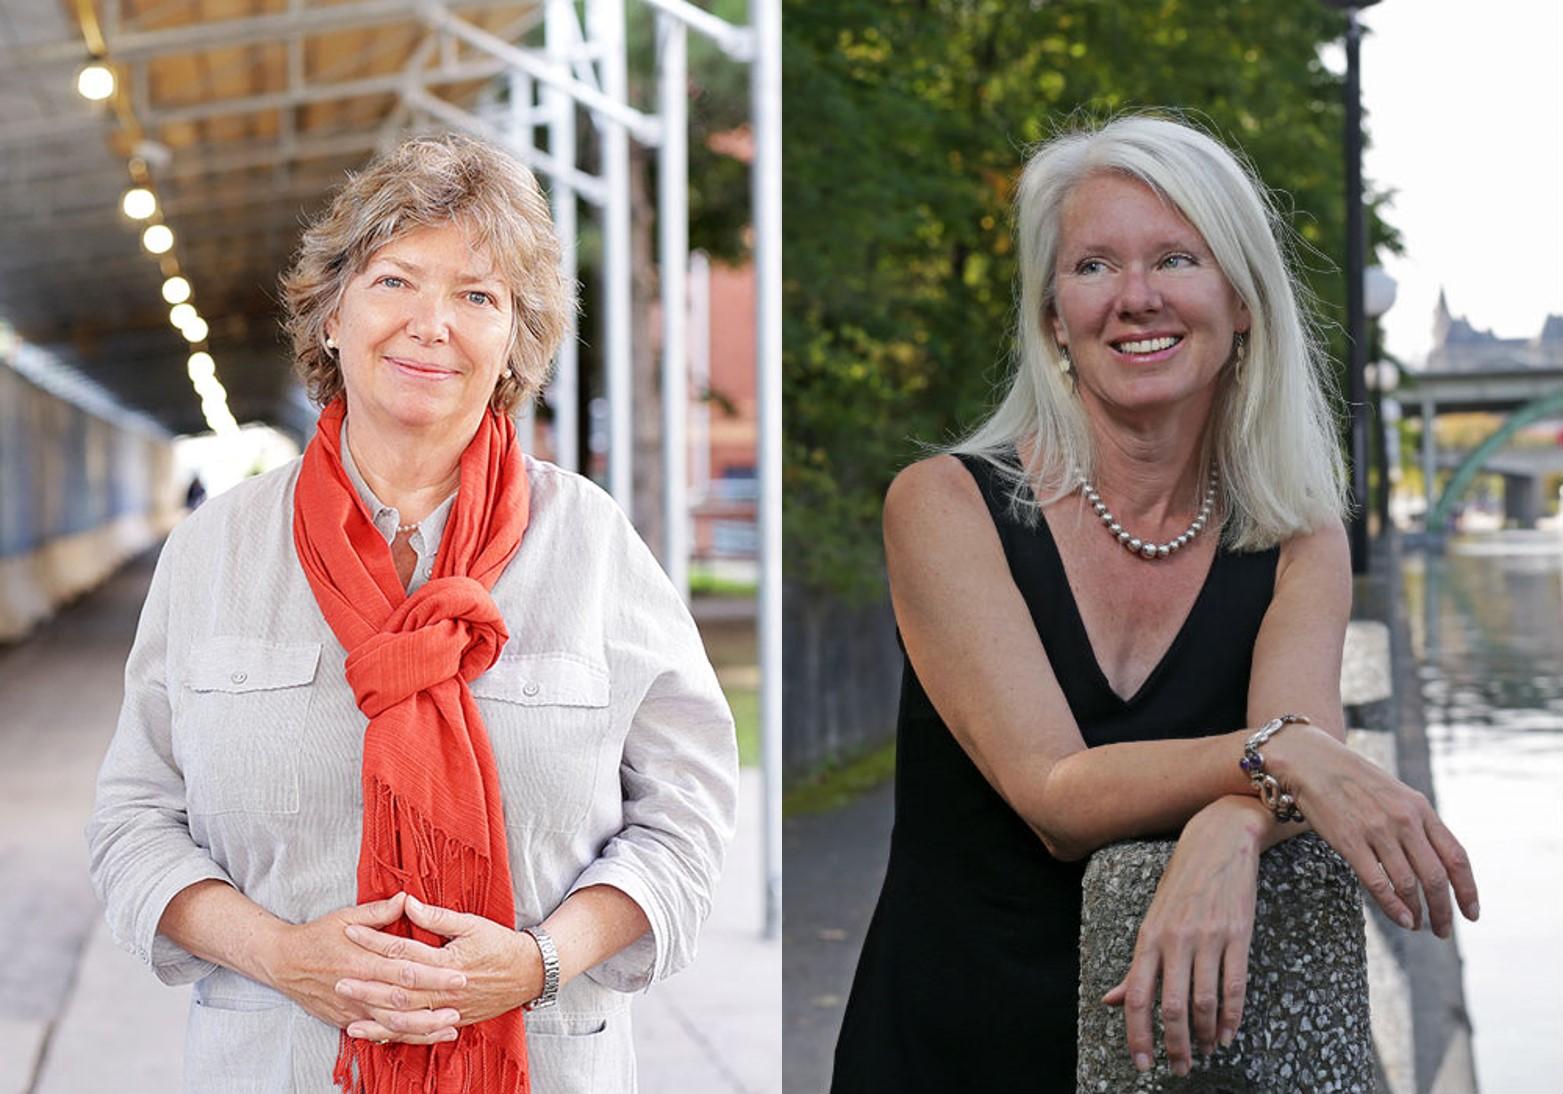 Les professeures Katherine Lippel and Lori Beaman